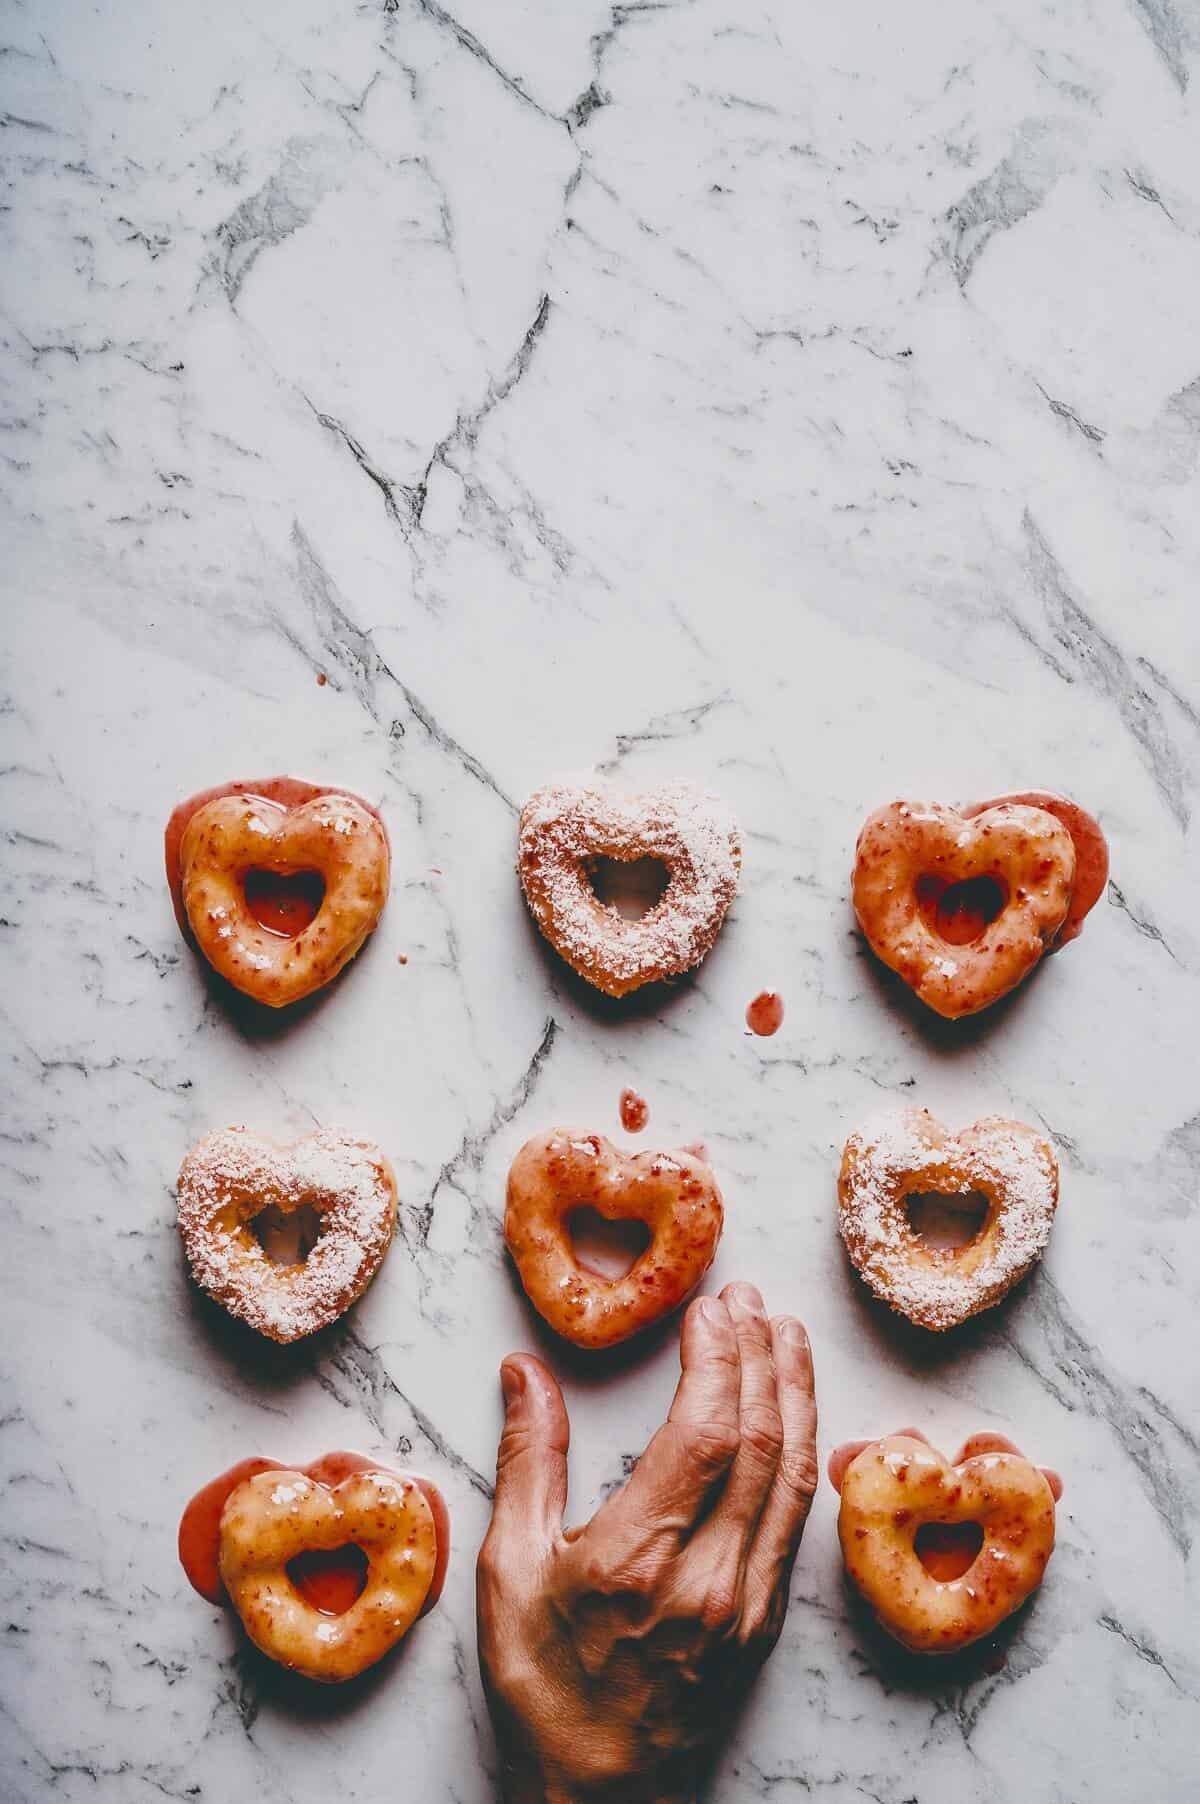 a hand reaching to grab a heart shaped doughnut